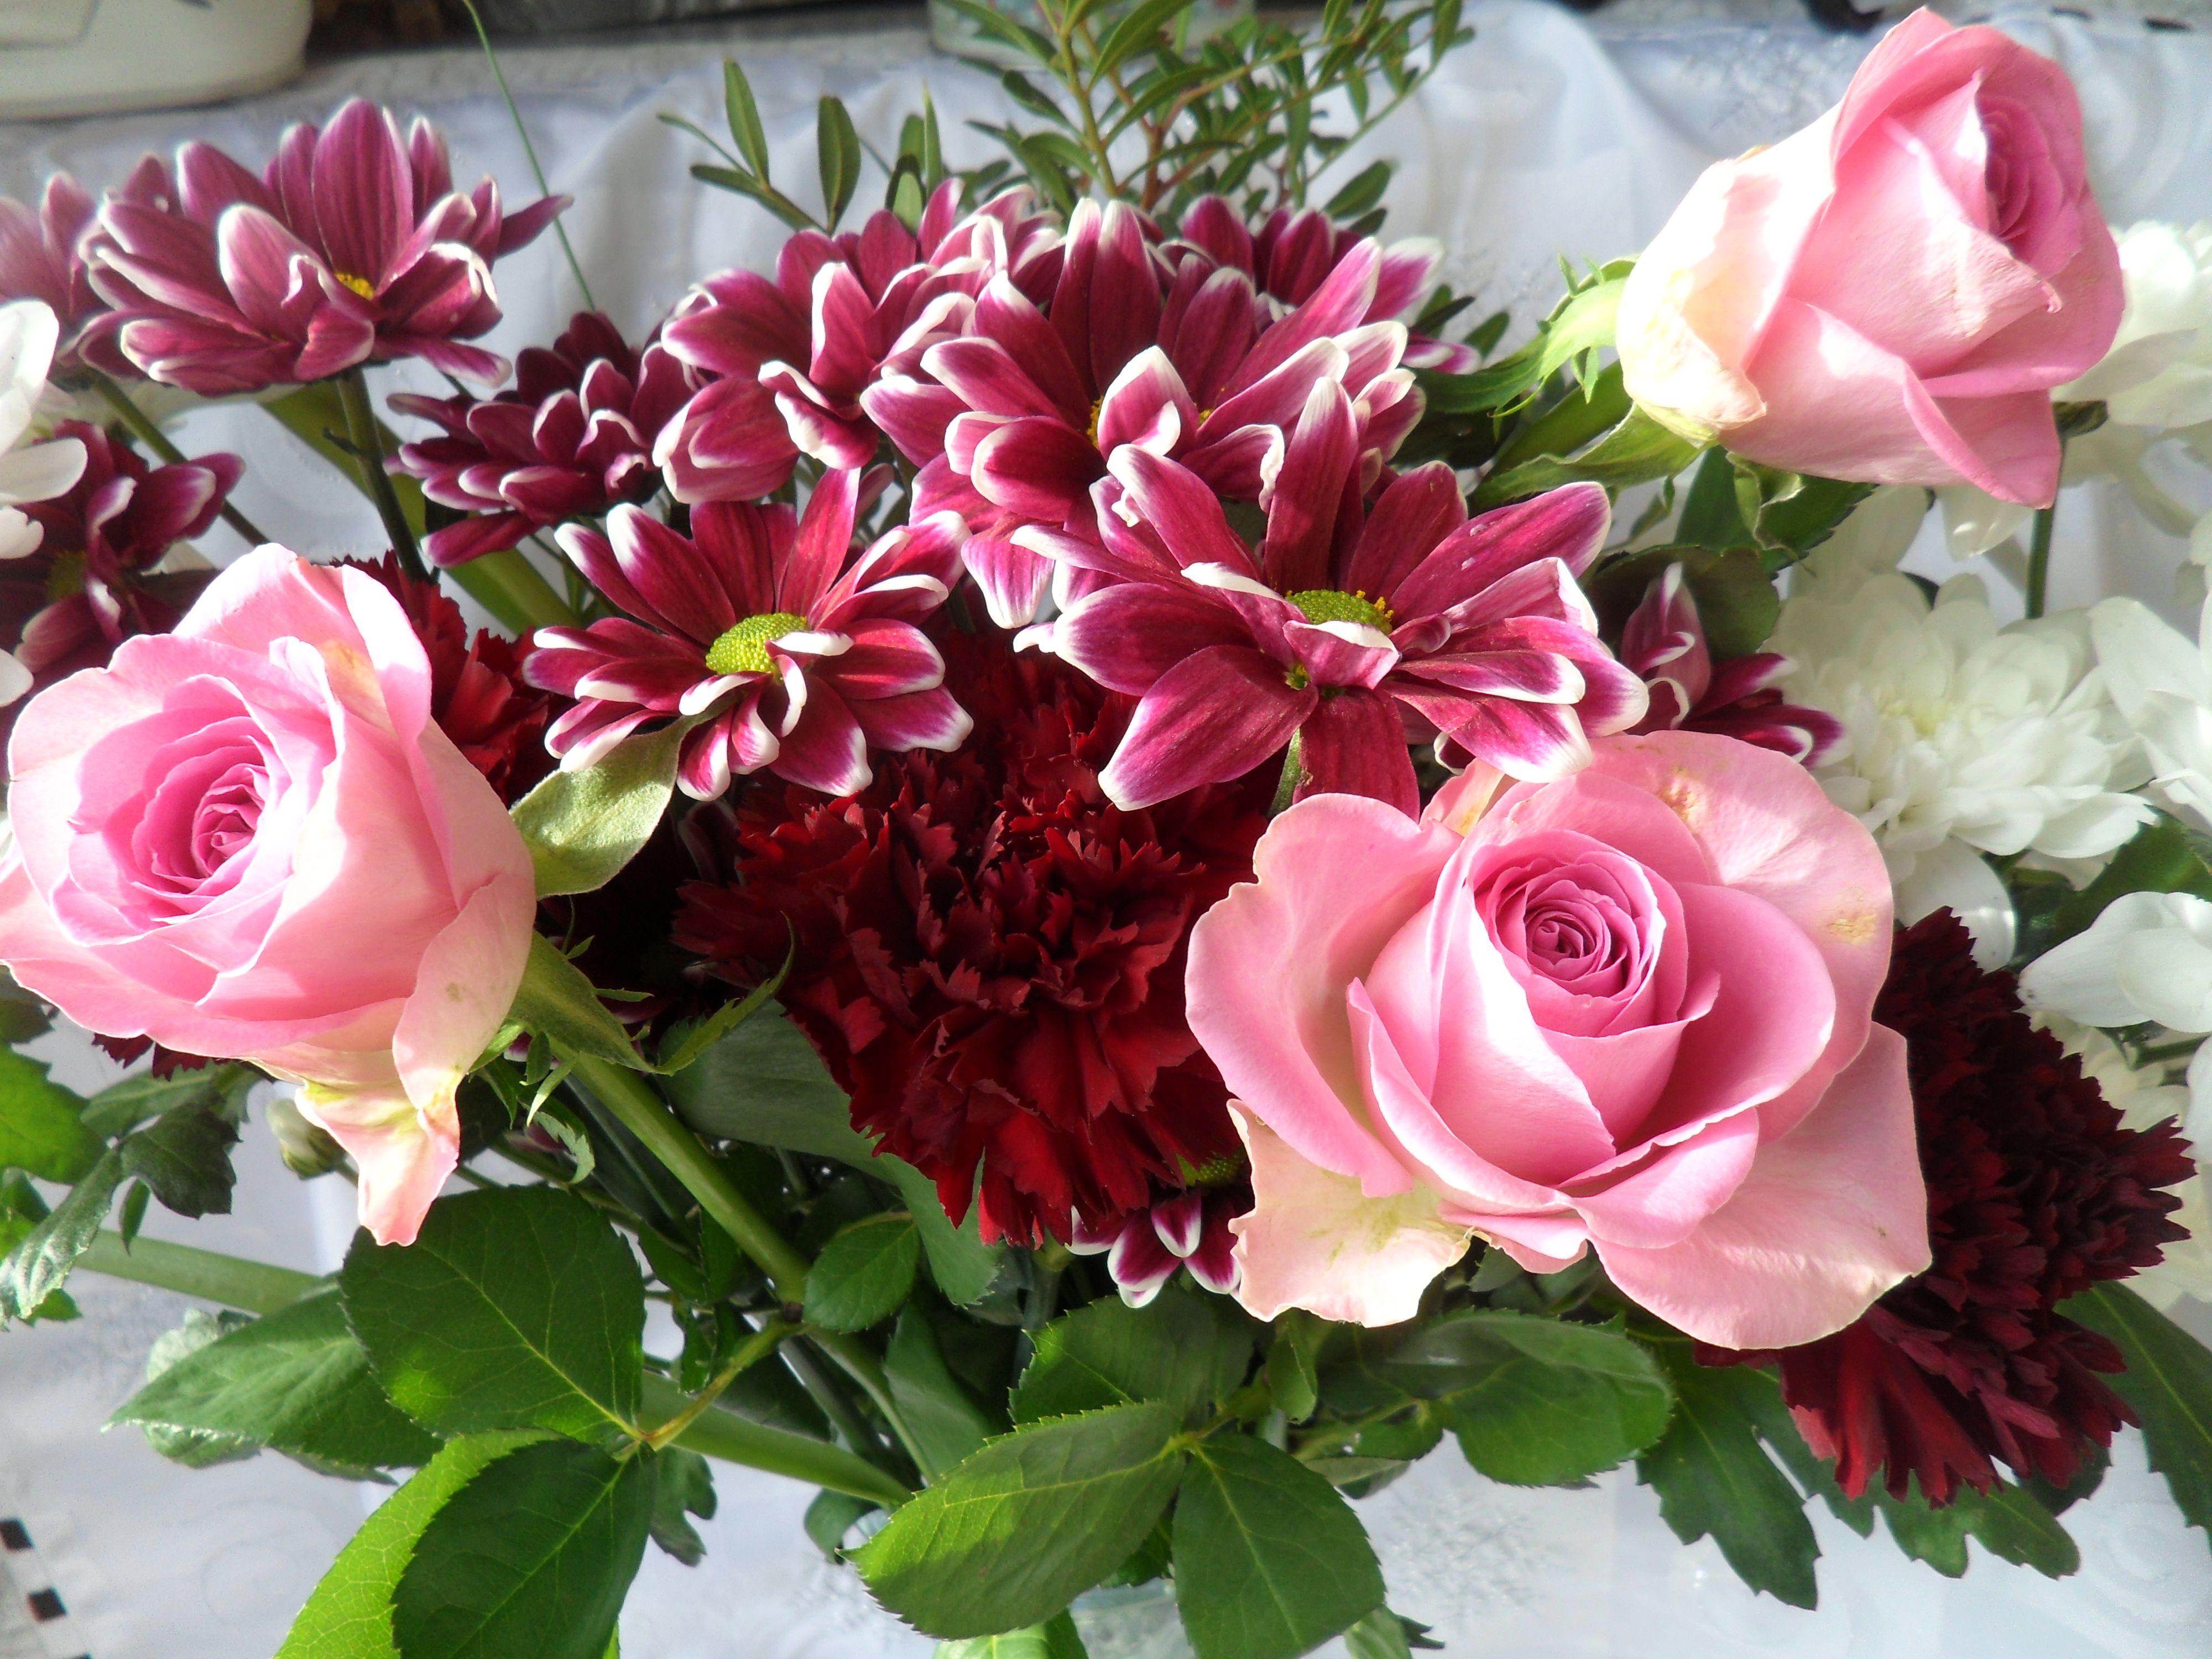 Birthday Flowers January 2014 Birthday Cards And Pressies